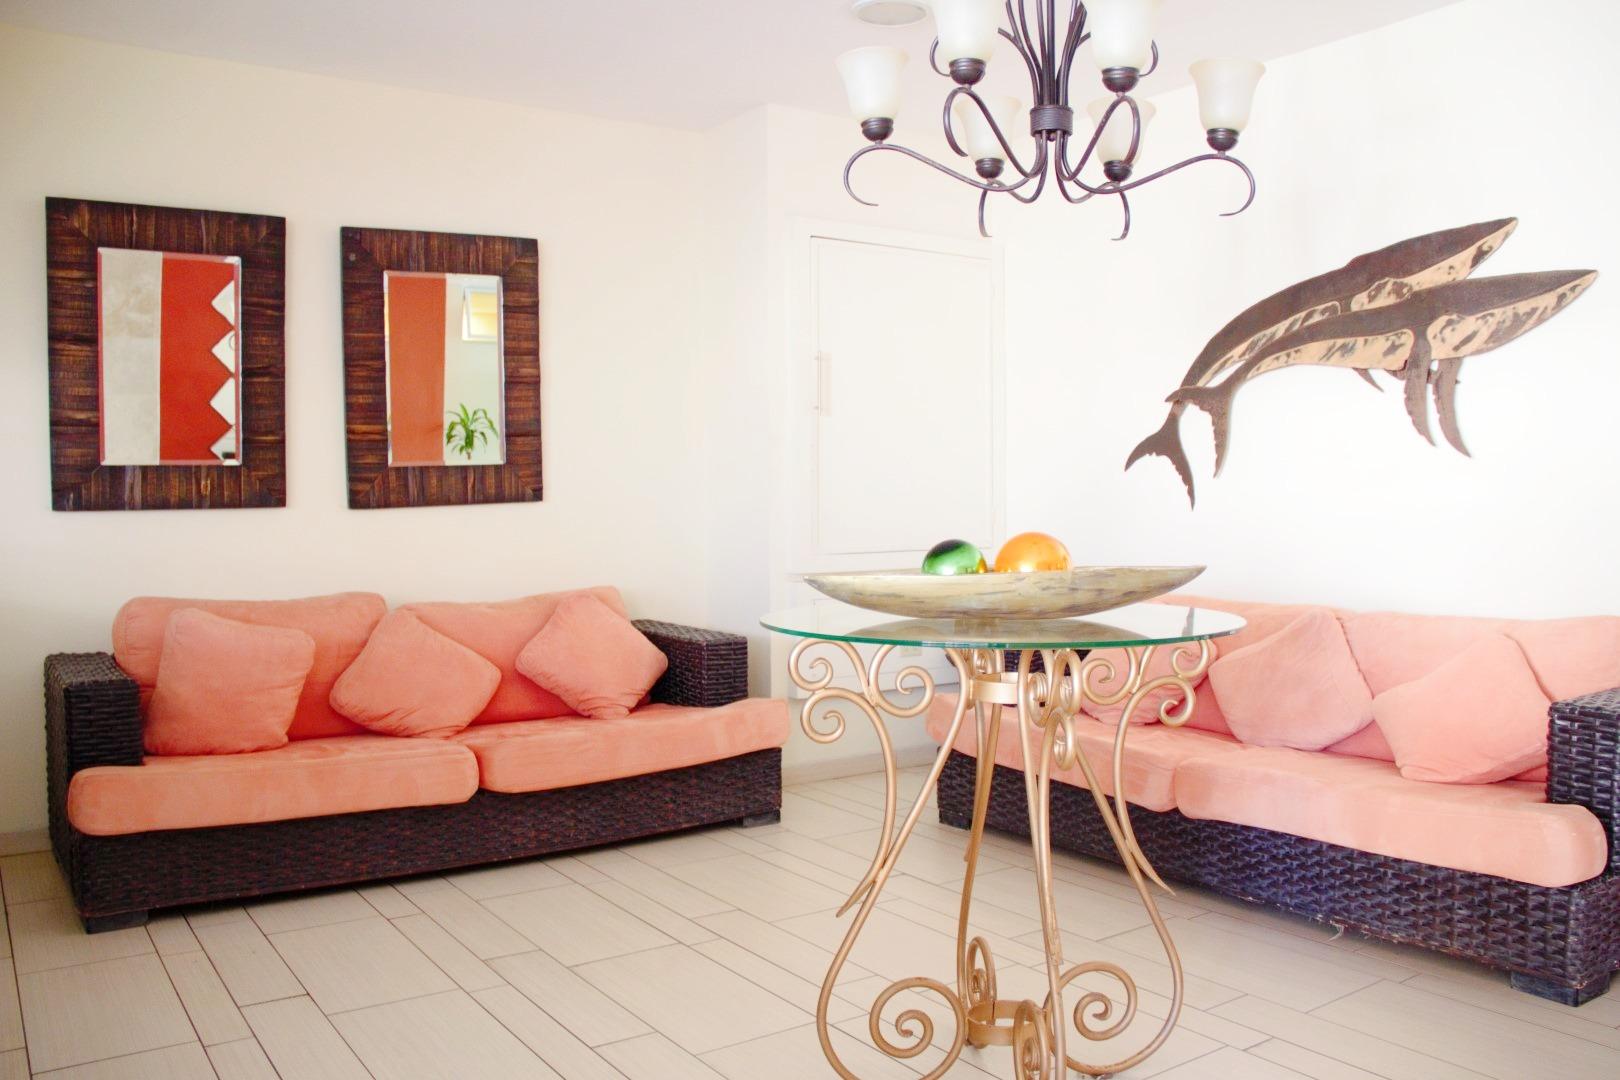 Ocean Palms lobby.